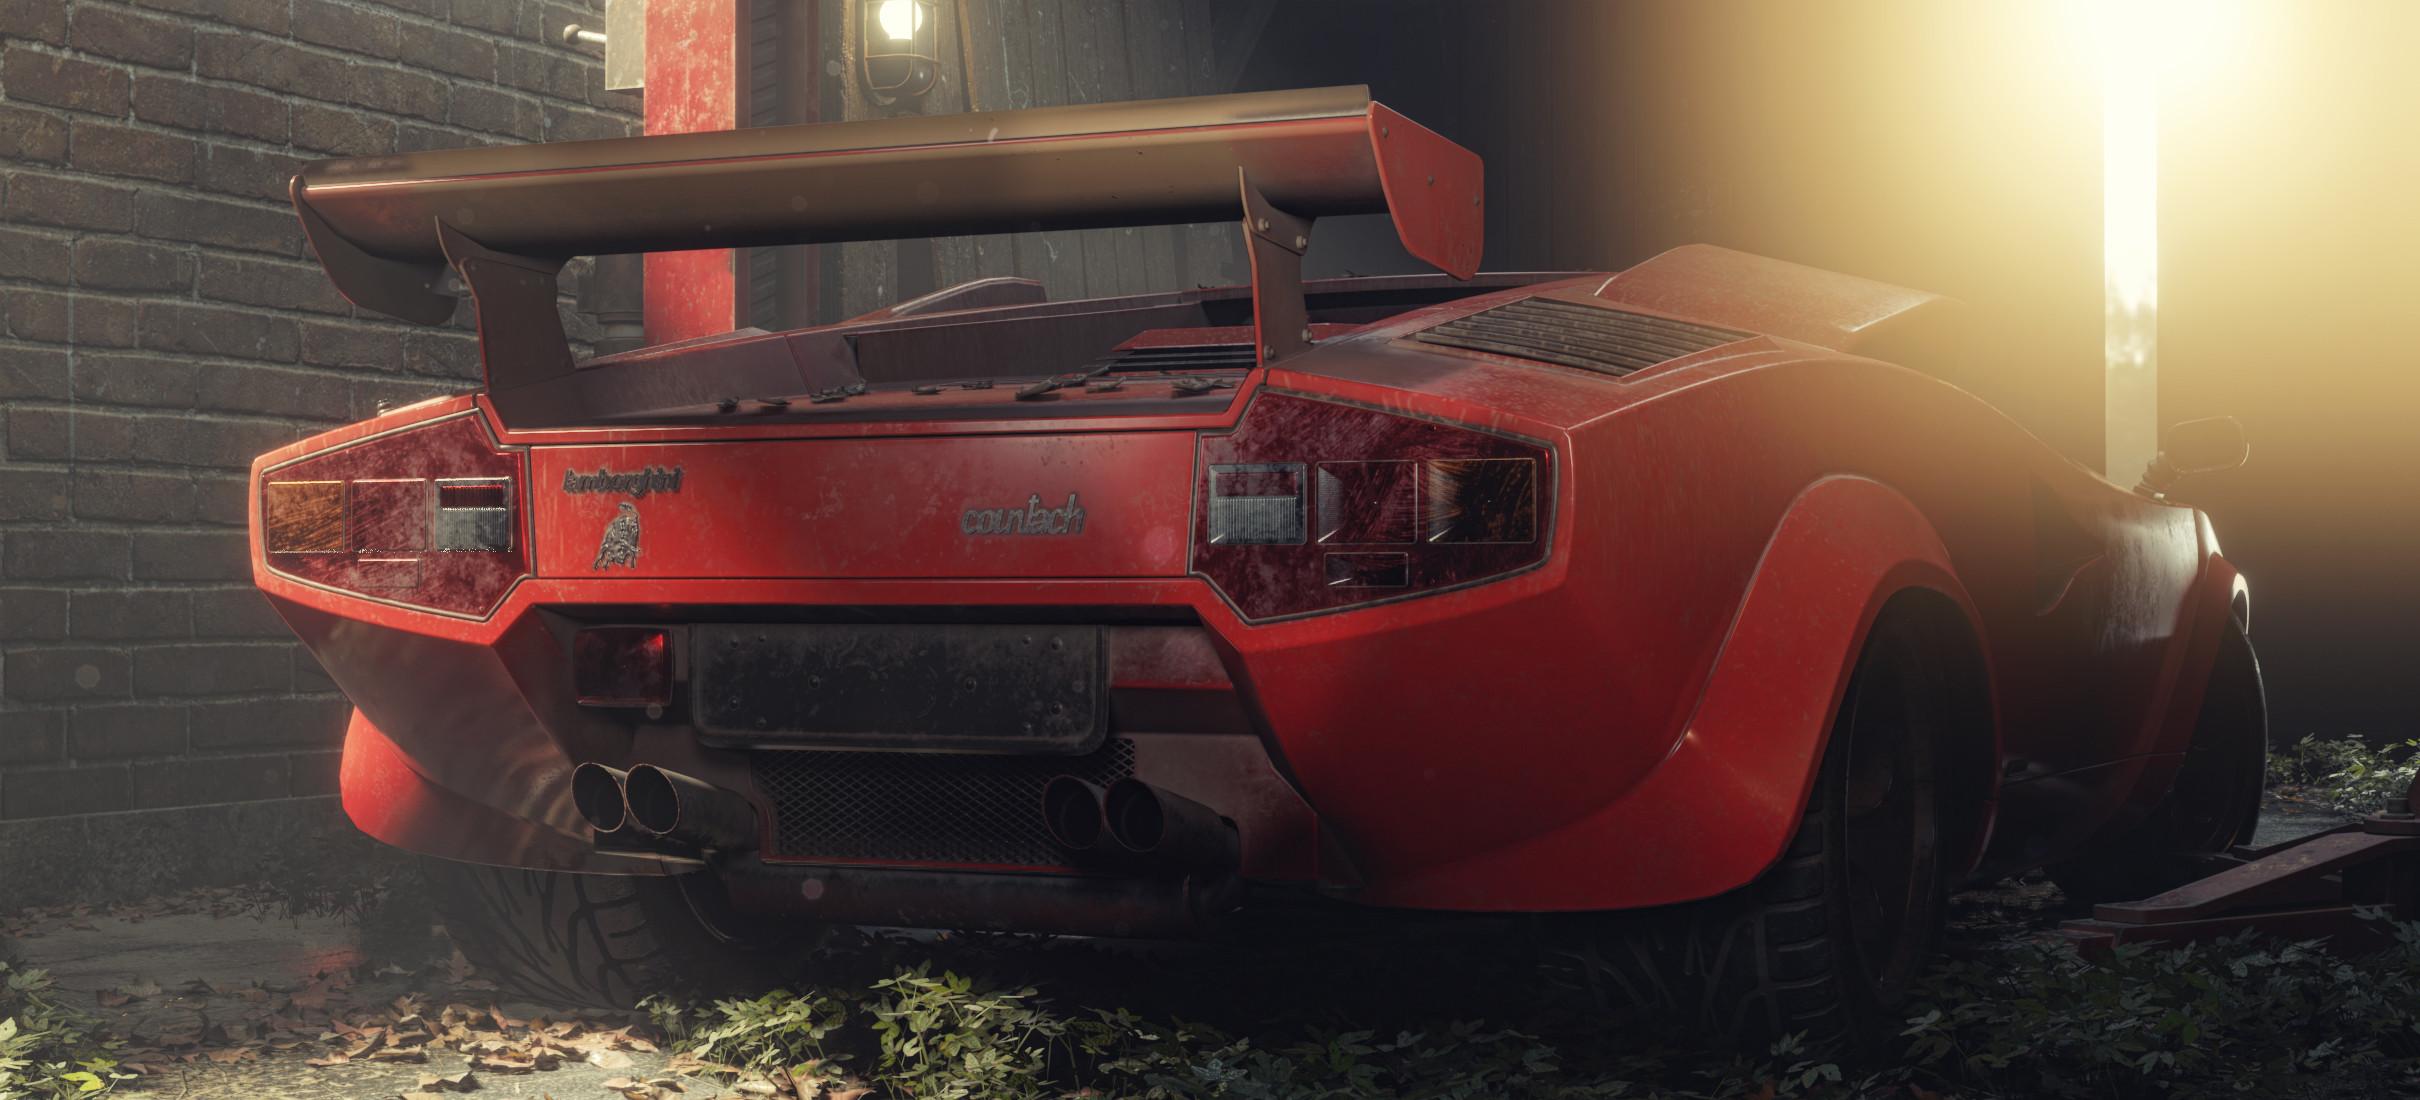 General 2420x1100 Pavel Golubev car vehicle Lamborghini Lamborghini Countach digital art red cars